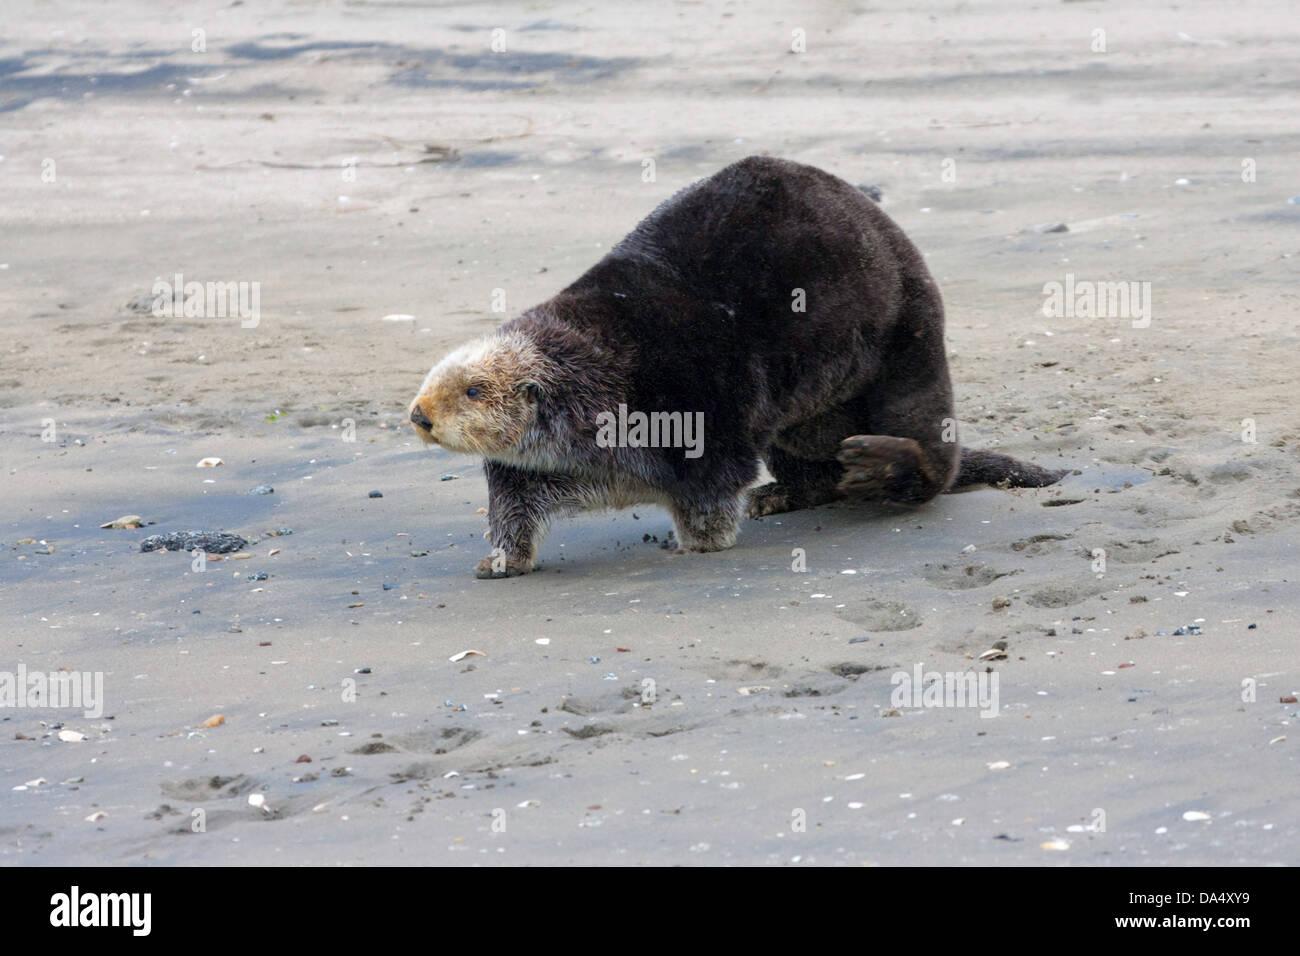 Sea Otter Enhydra lutris Monterey Bay, California, United States 24 June Adult on beach. Mustelidae - Stock Image